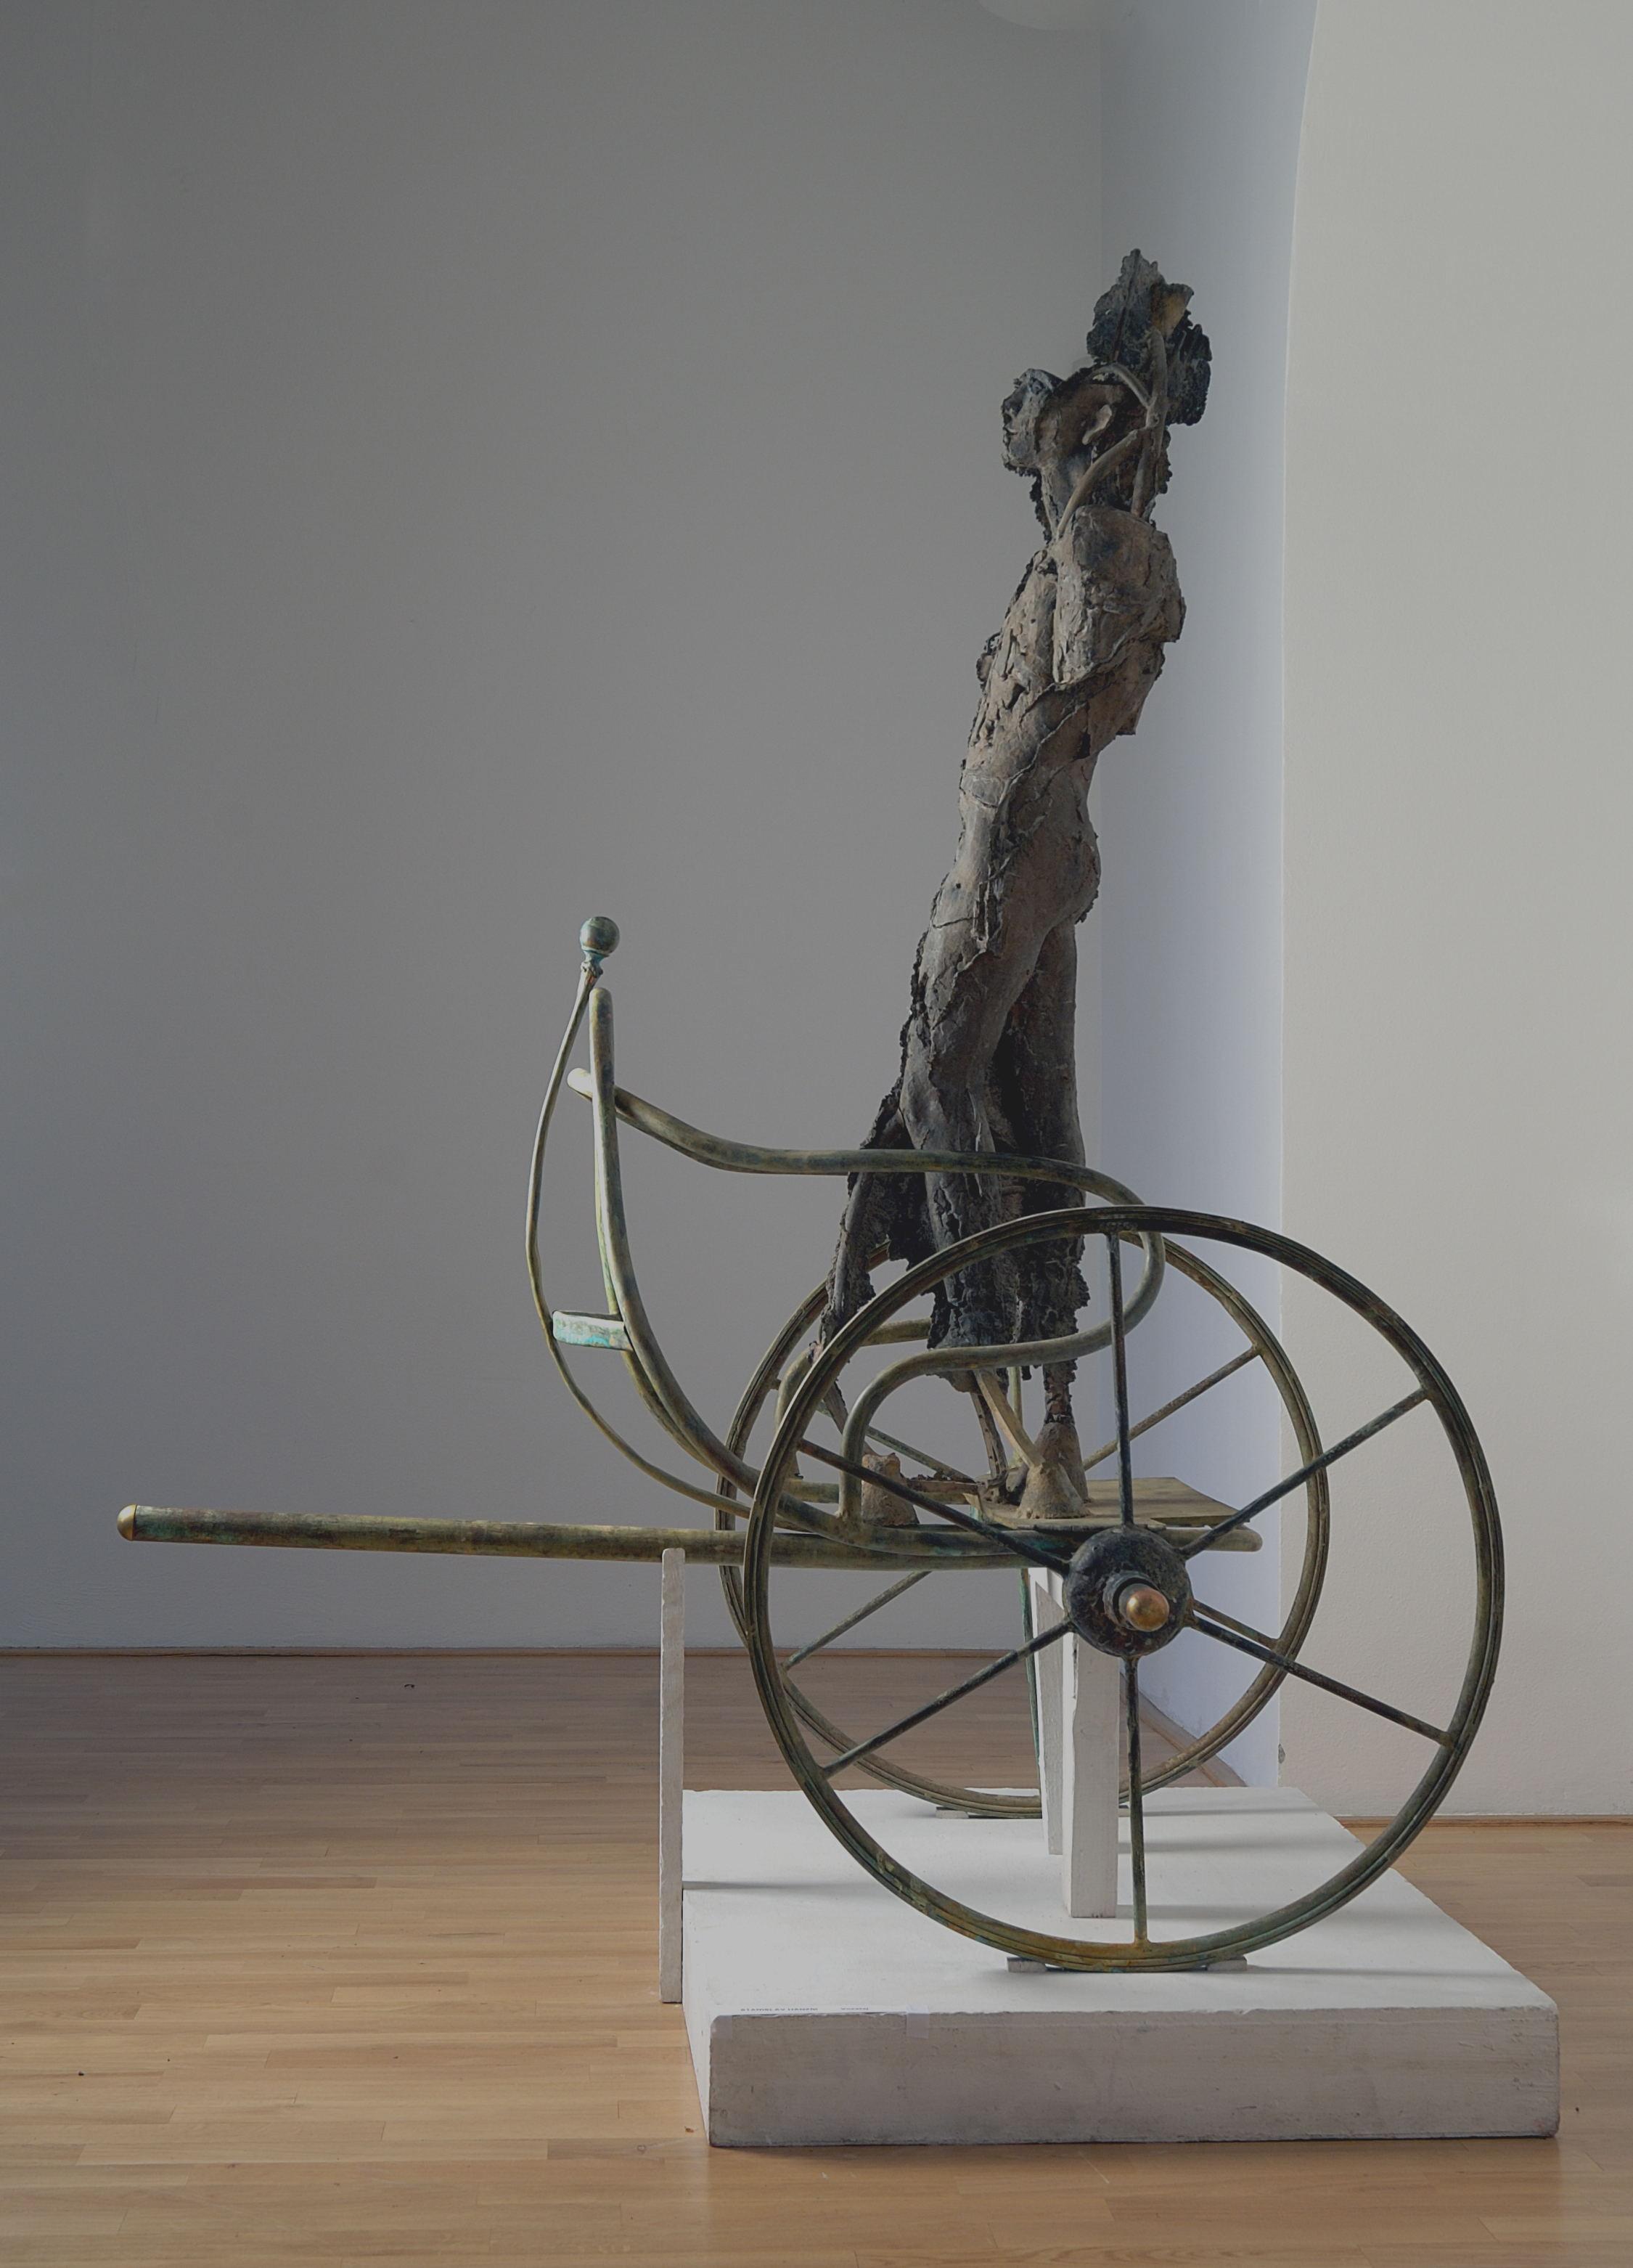 Charioteer, S. Hanzik, 1999